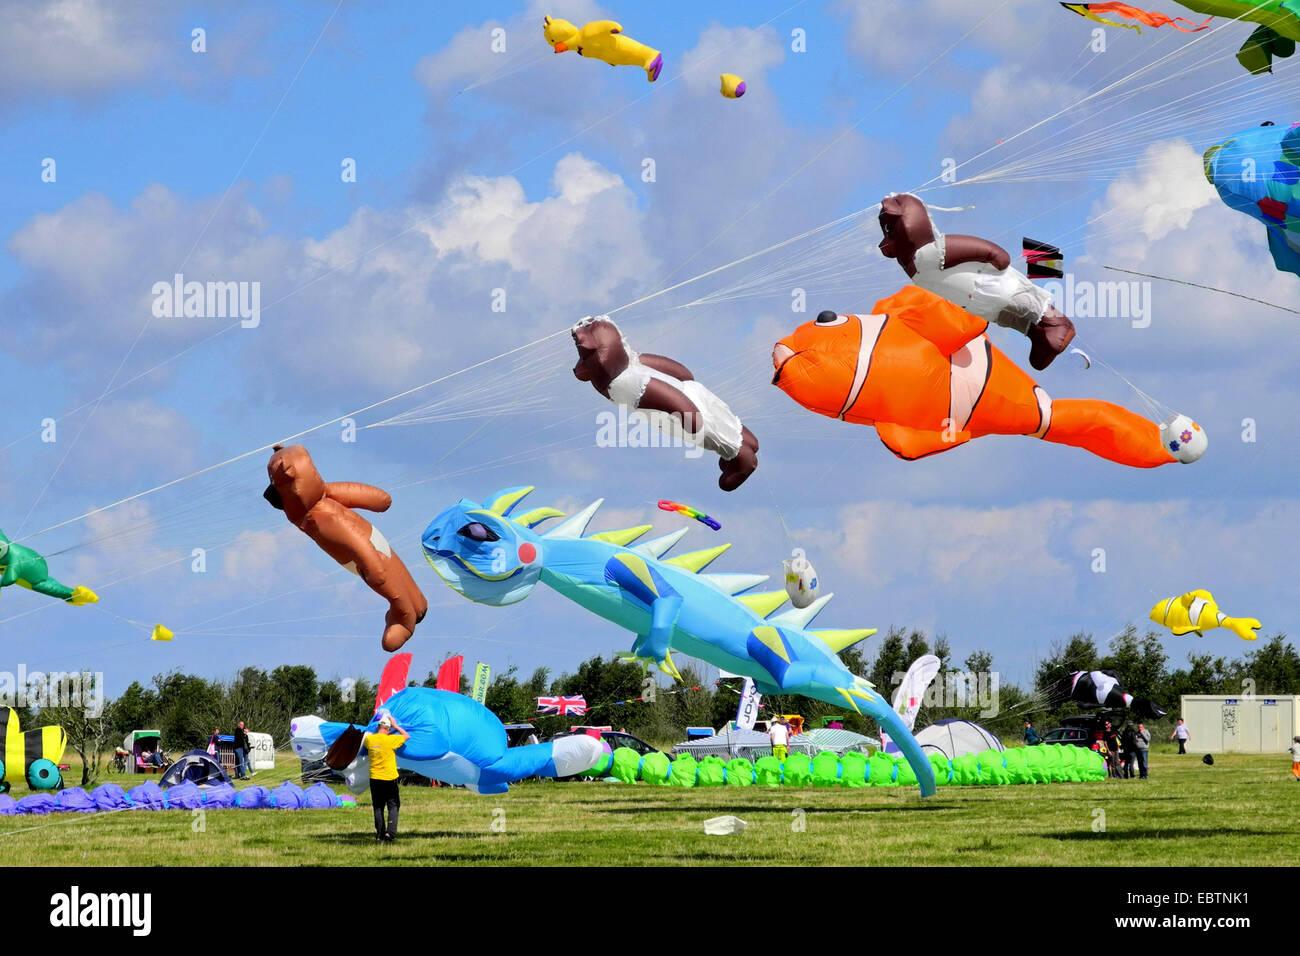 kites at the kite festival in Schillig, Germany, Lower Saxony, Frisia, Wangerland - Stock Image